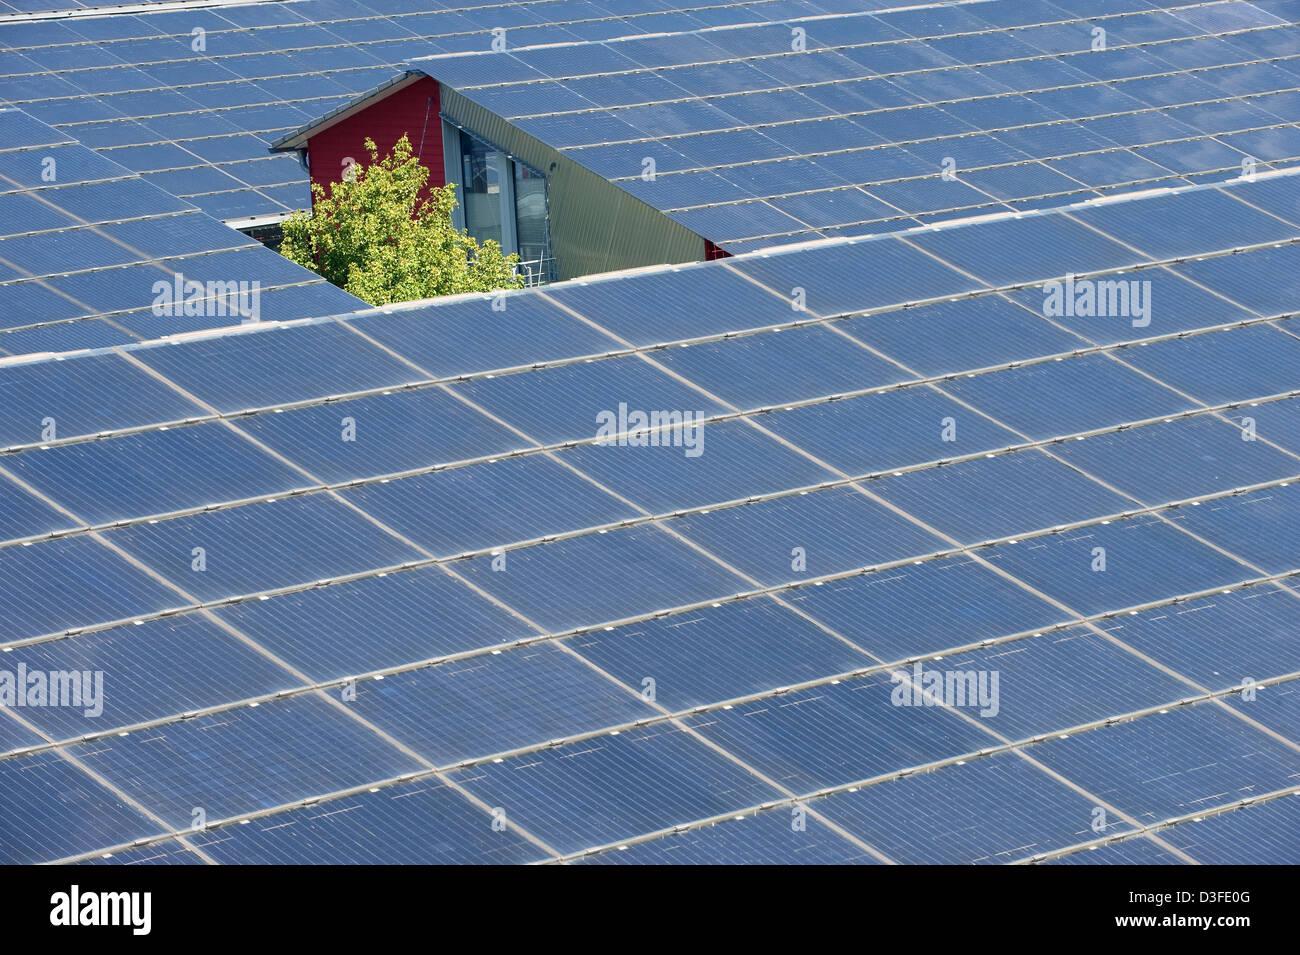 Freiburg, Germany, solar panels on the roofs in Vauban - Stock Image